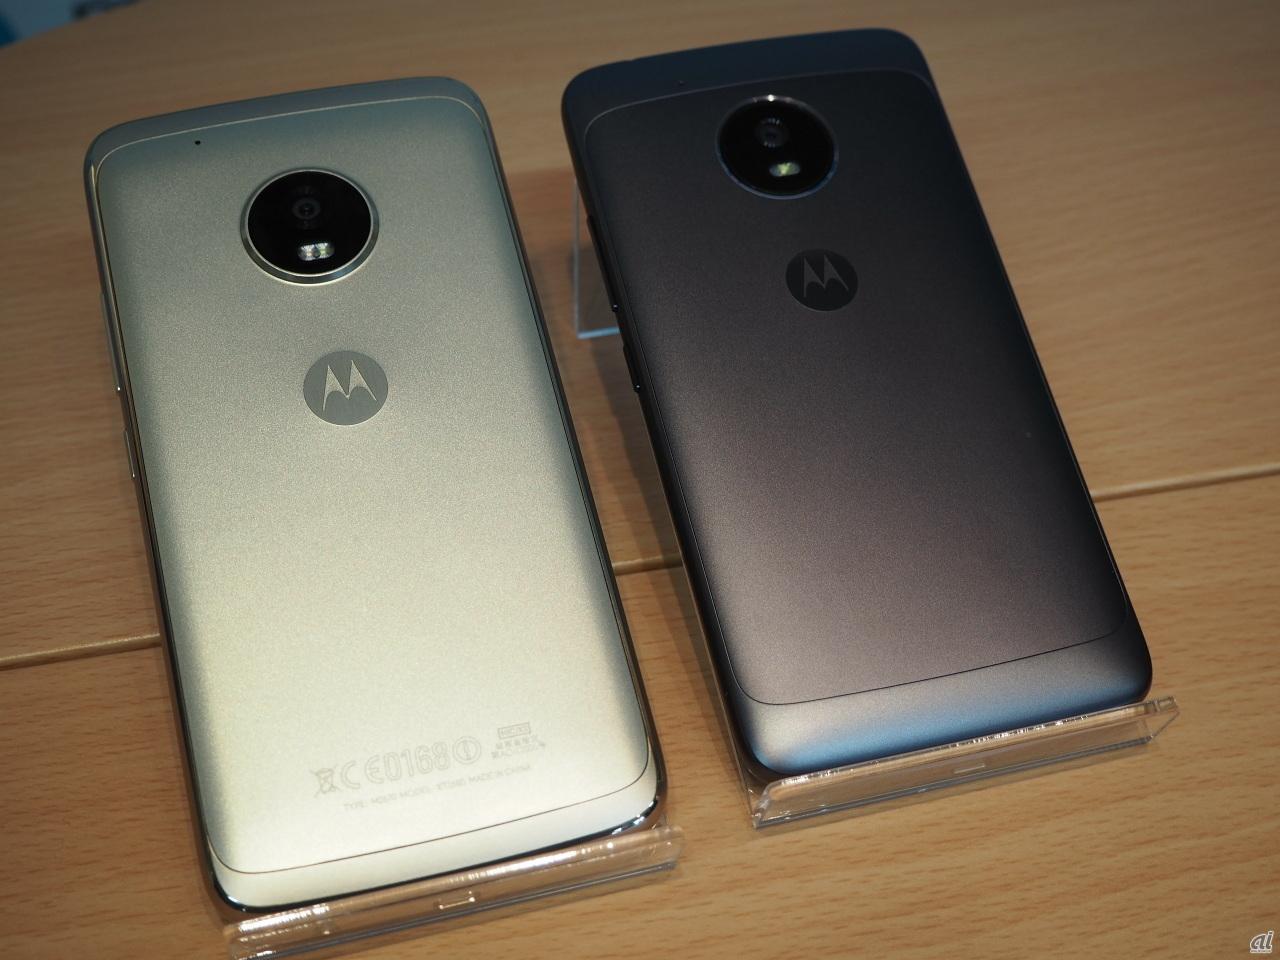 「Moto G5 Plus」(左)と「Moto G5」(右)。デザインは似ているが、大きさとカメラ部分の突起が異なる